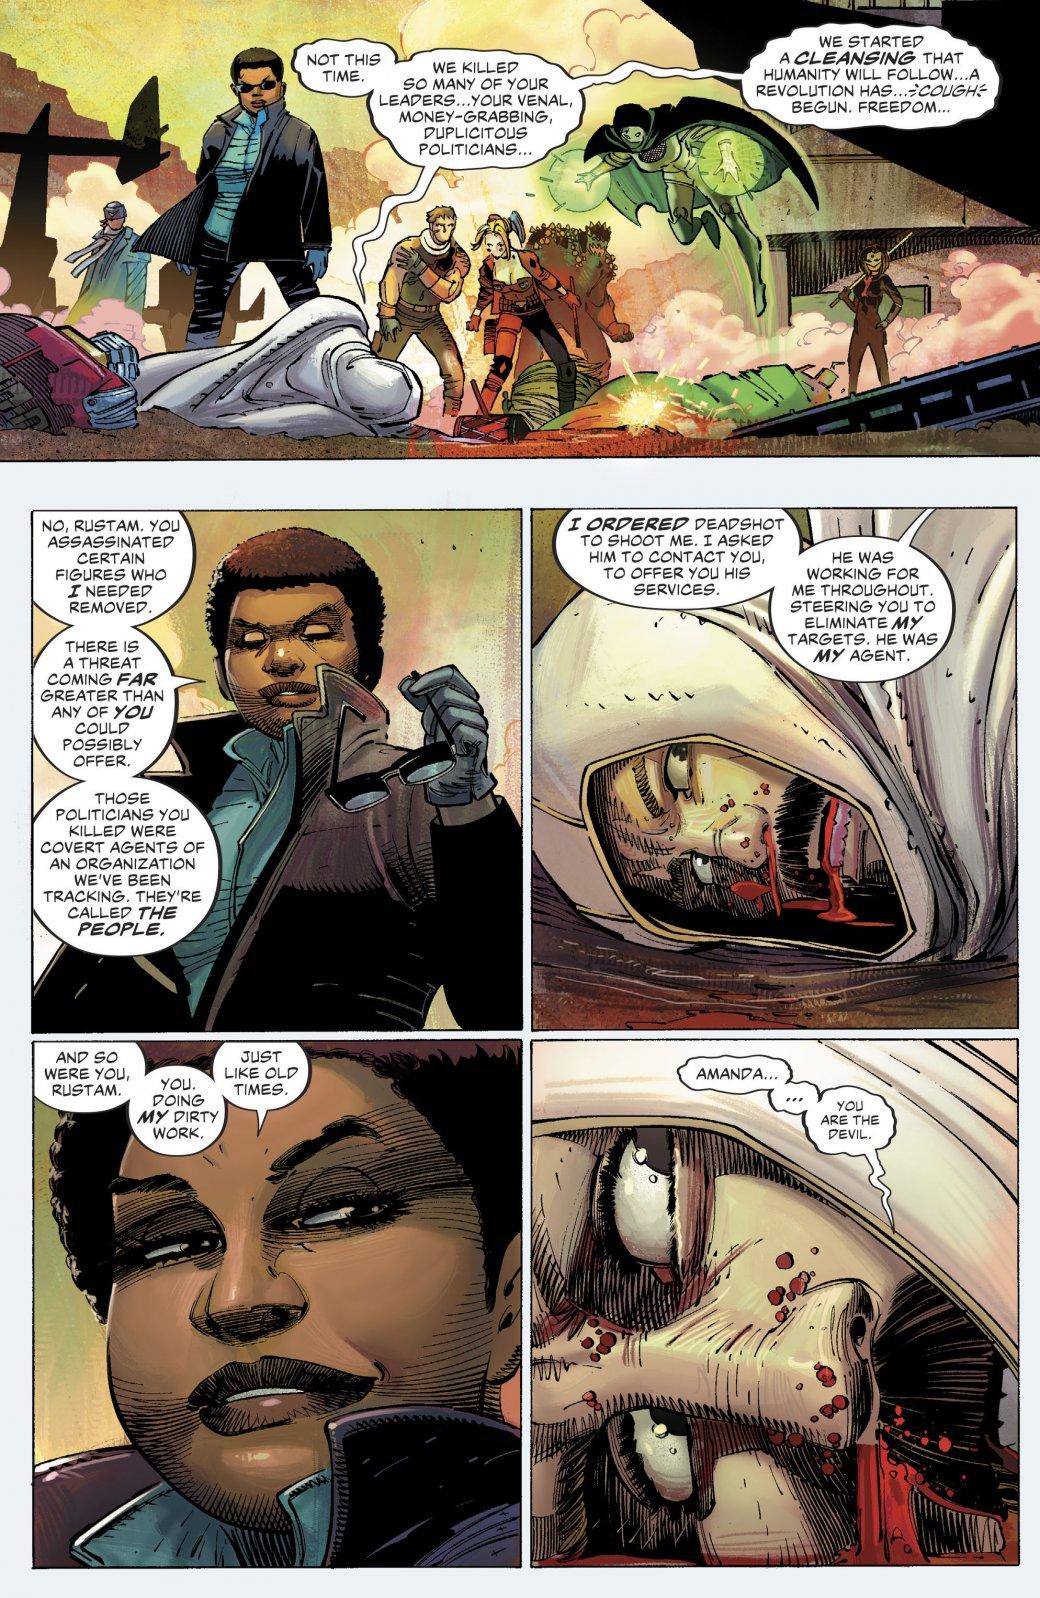 Глава Отряда самоубийц Аманда Уоллер все же не умерла, ее спасла магия